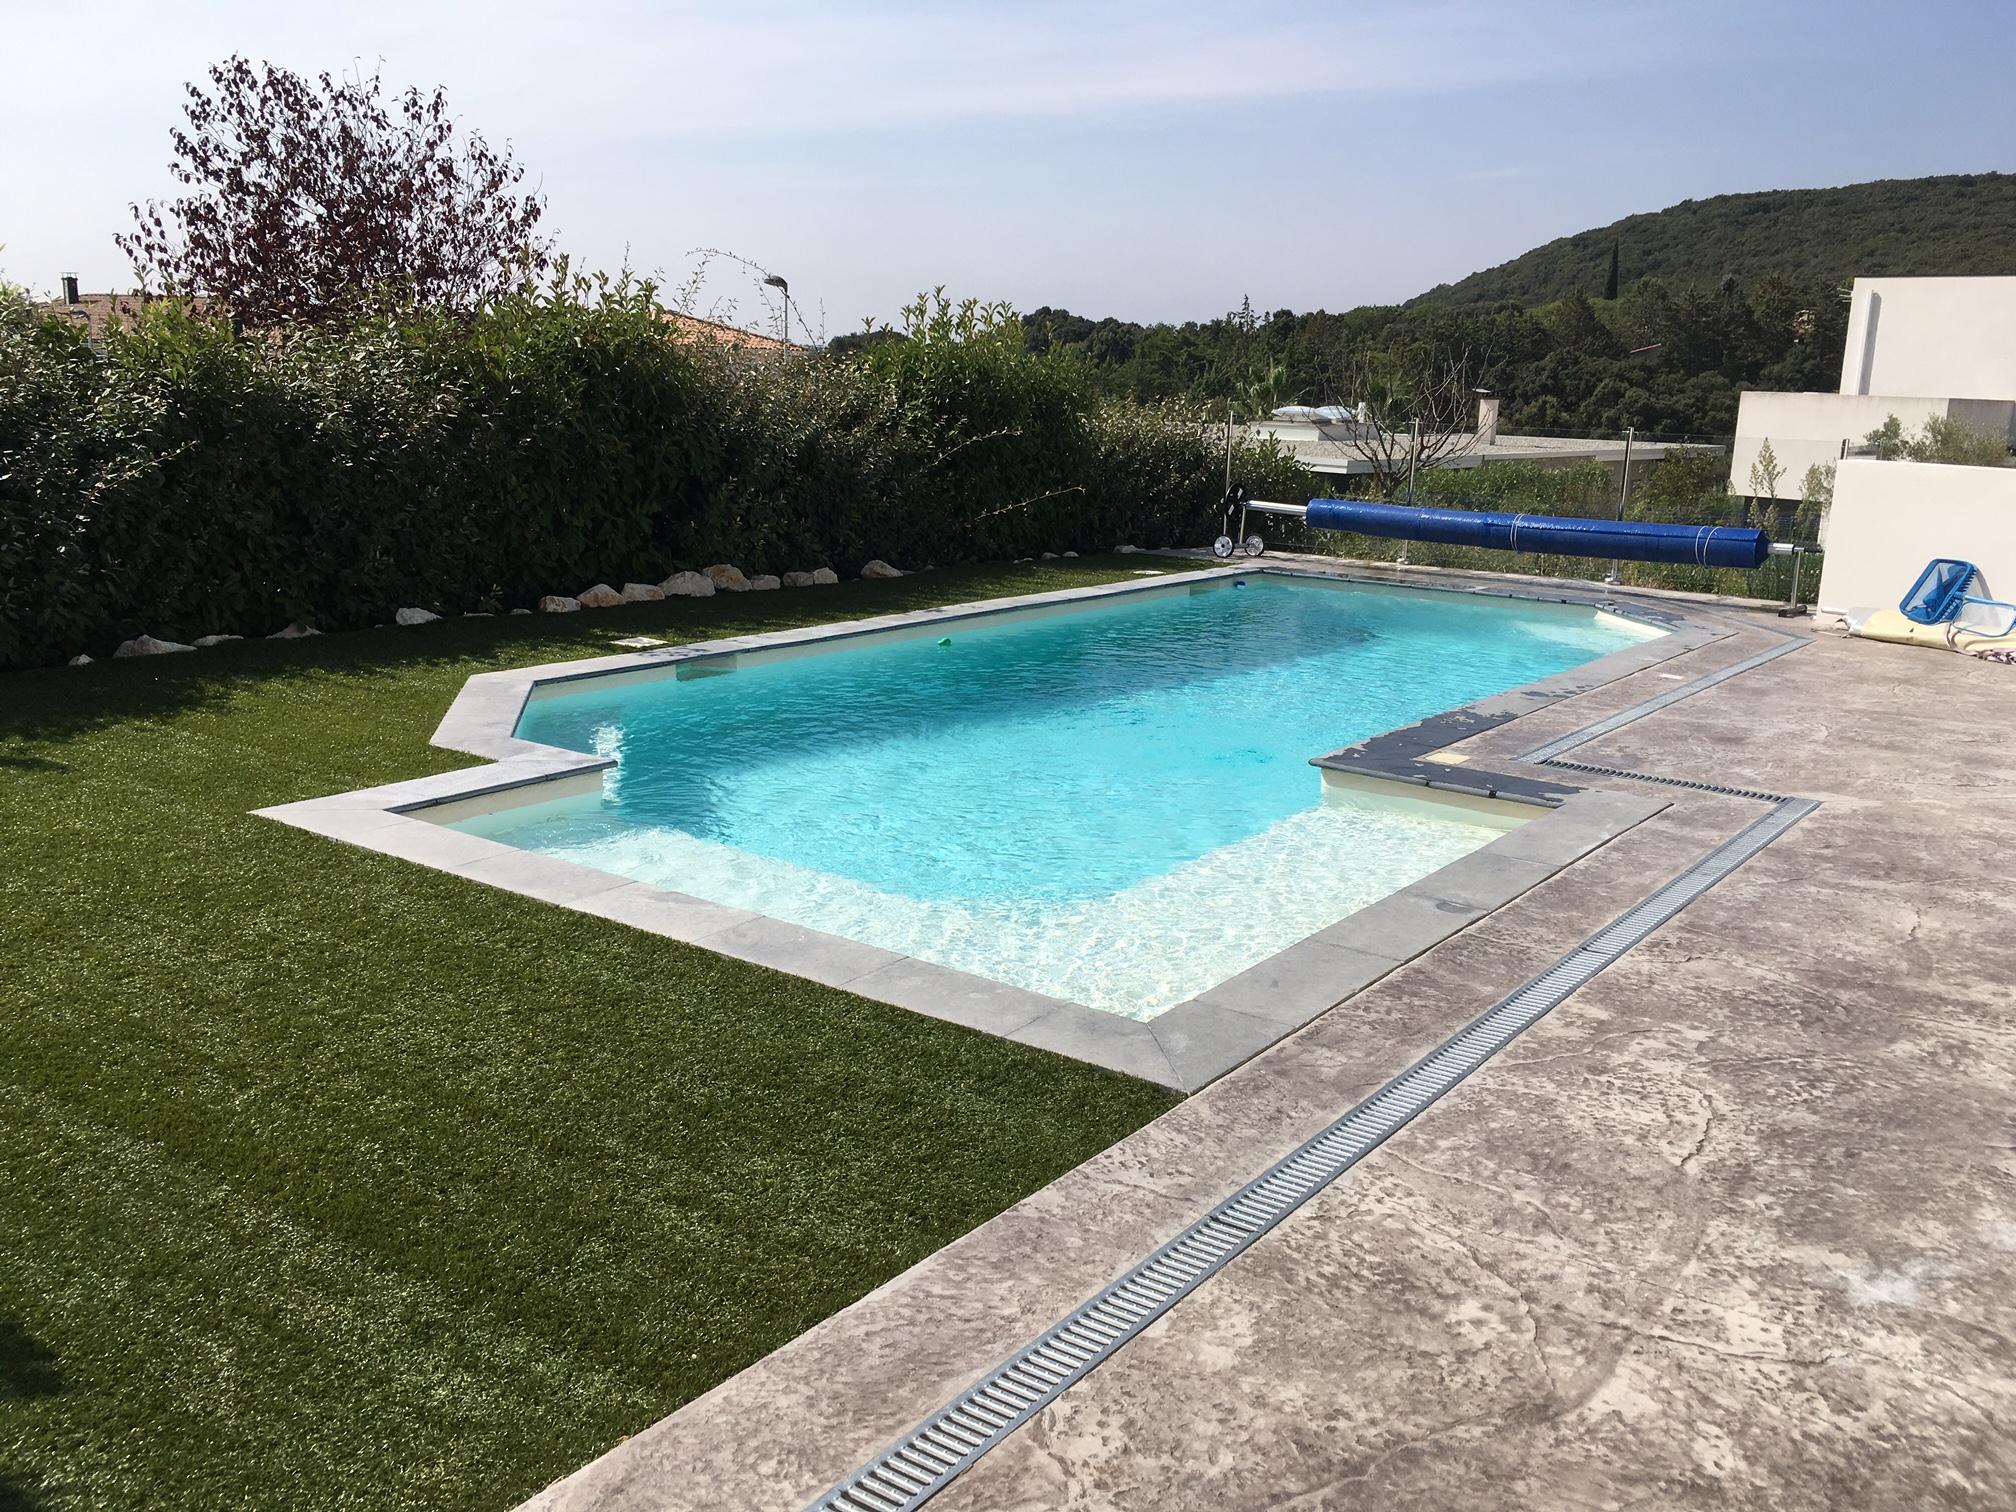 piscine effet plage professionnels ilo innove toujours. Black Bedroom Furniture Sets. Home Design Ideas